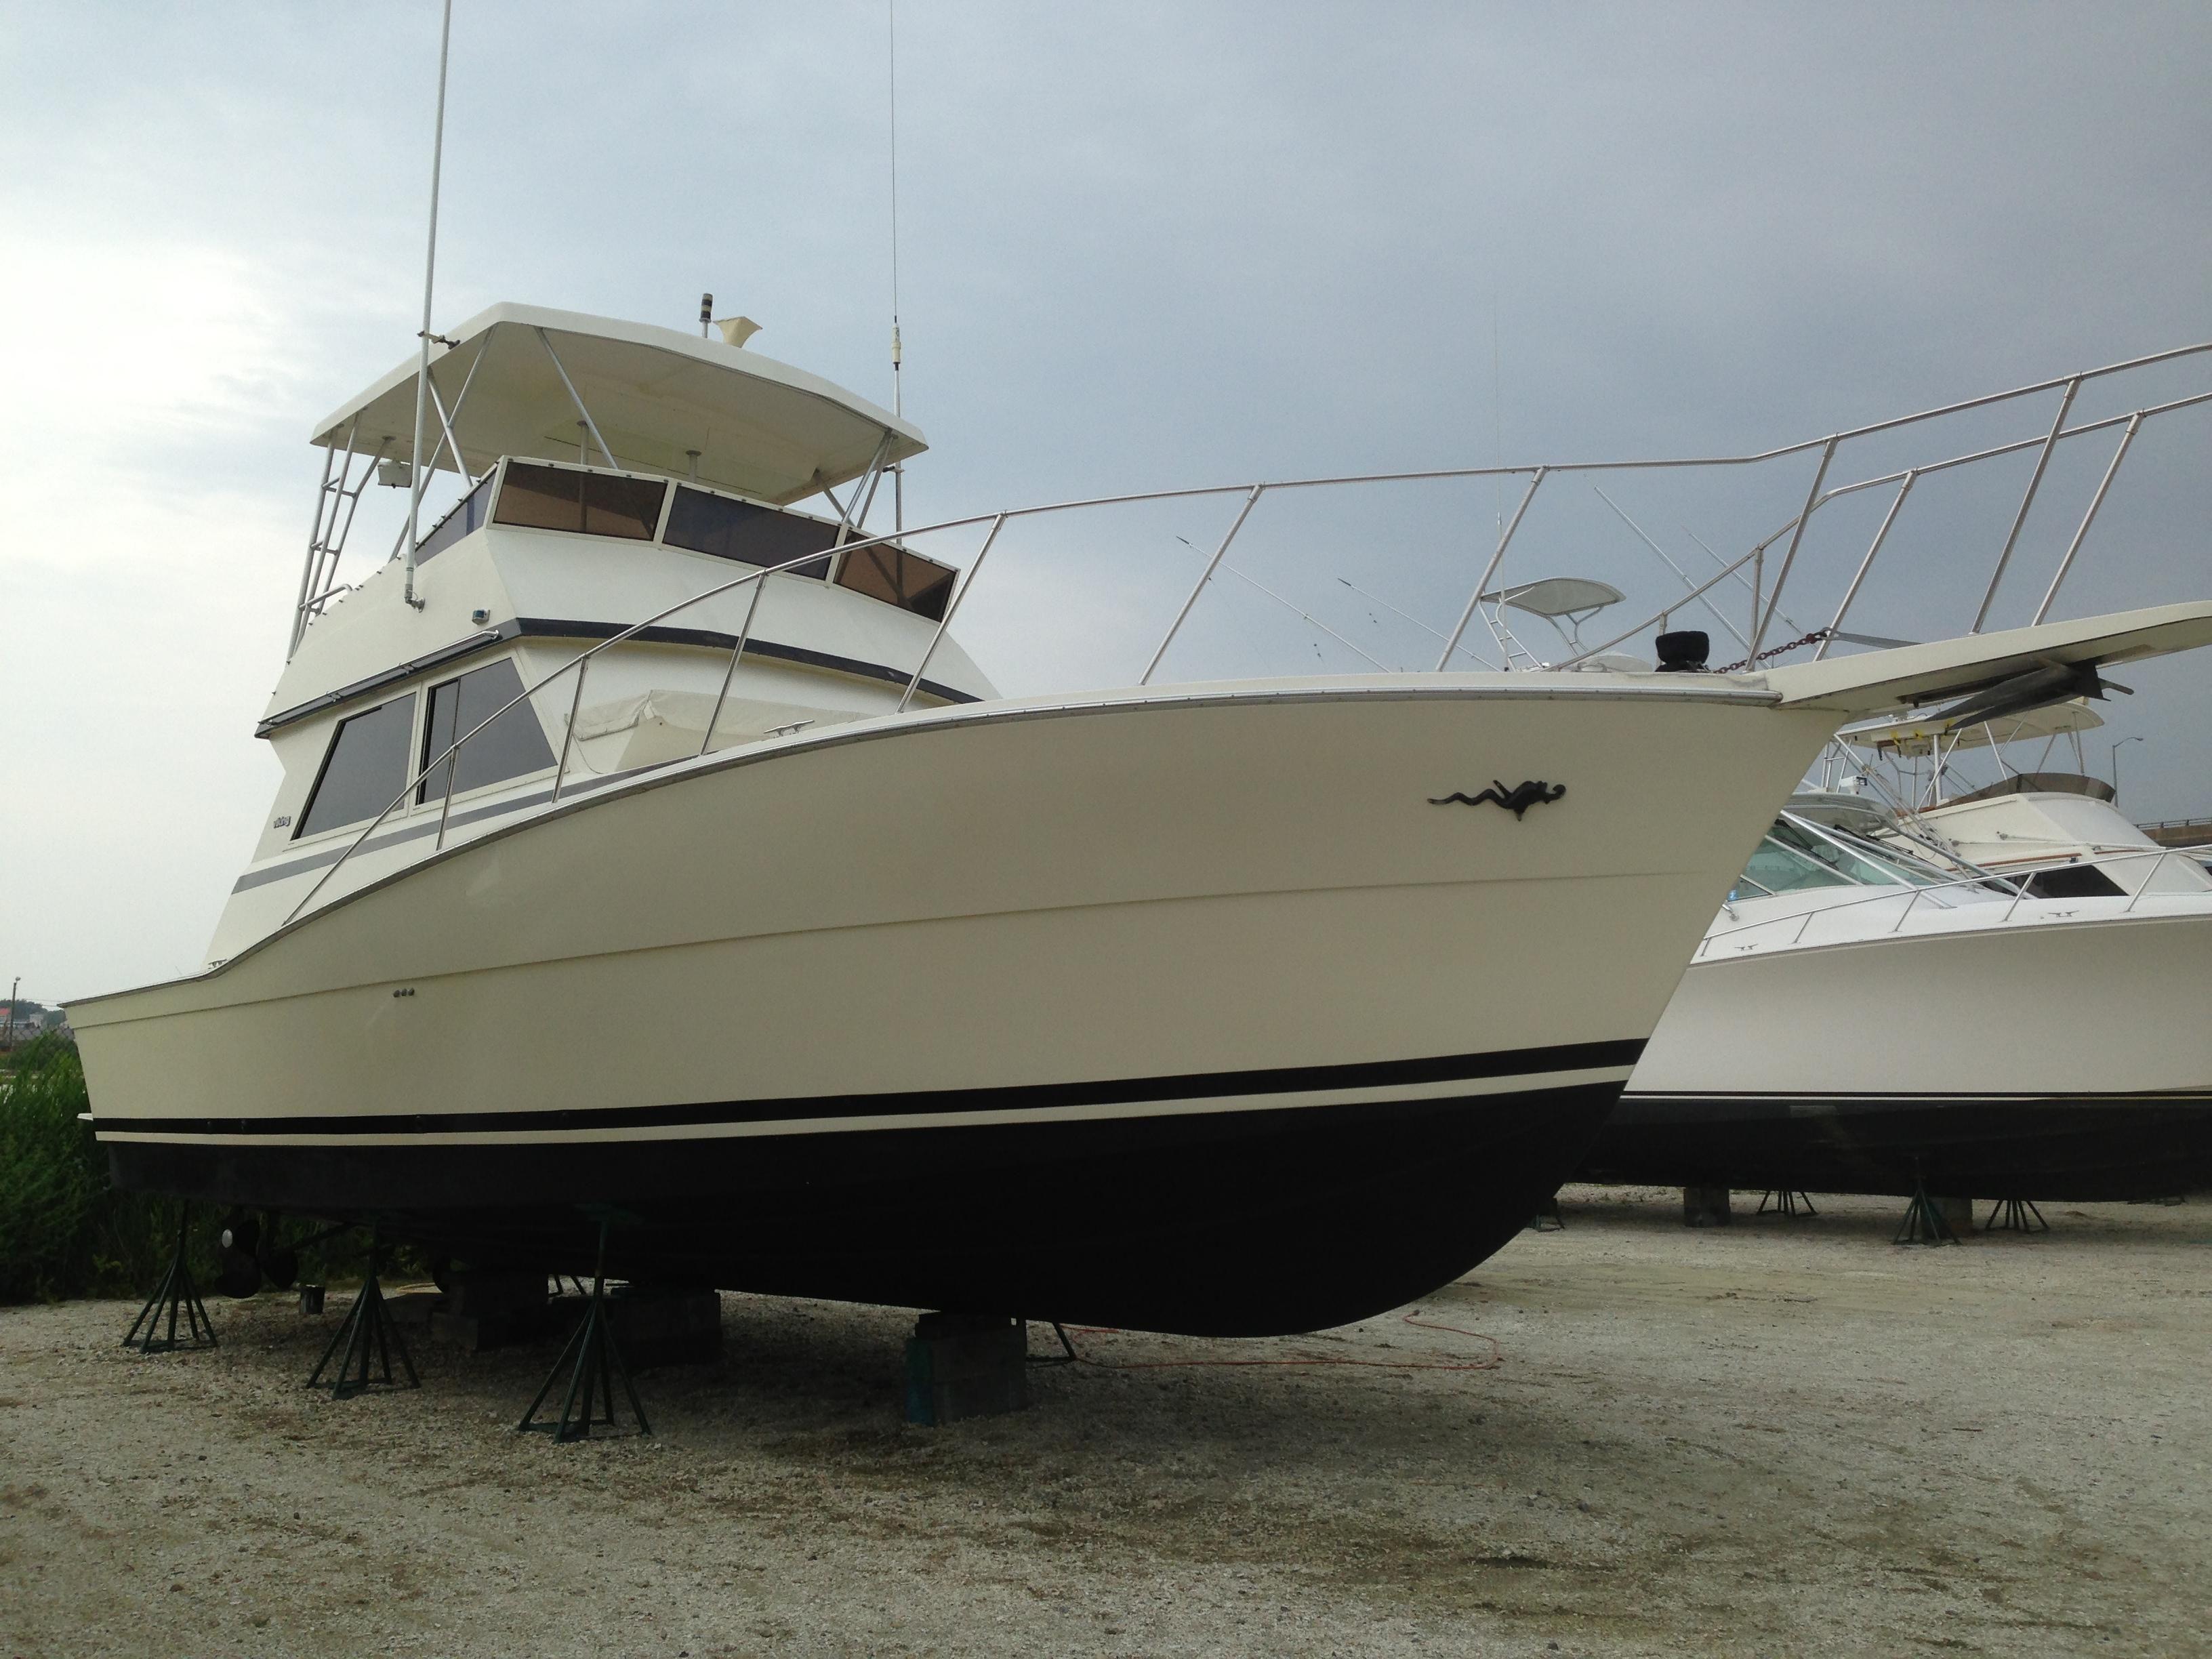 1986 viking 41 convt power boat for sale for Viking 43 double cabin motor yacht